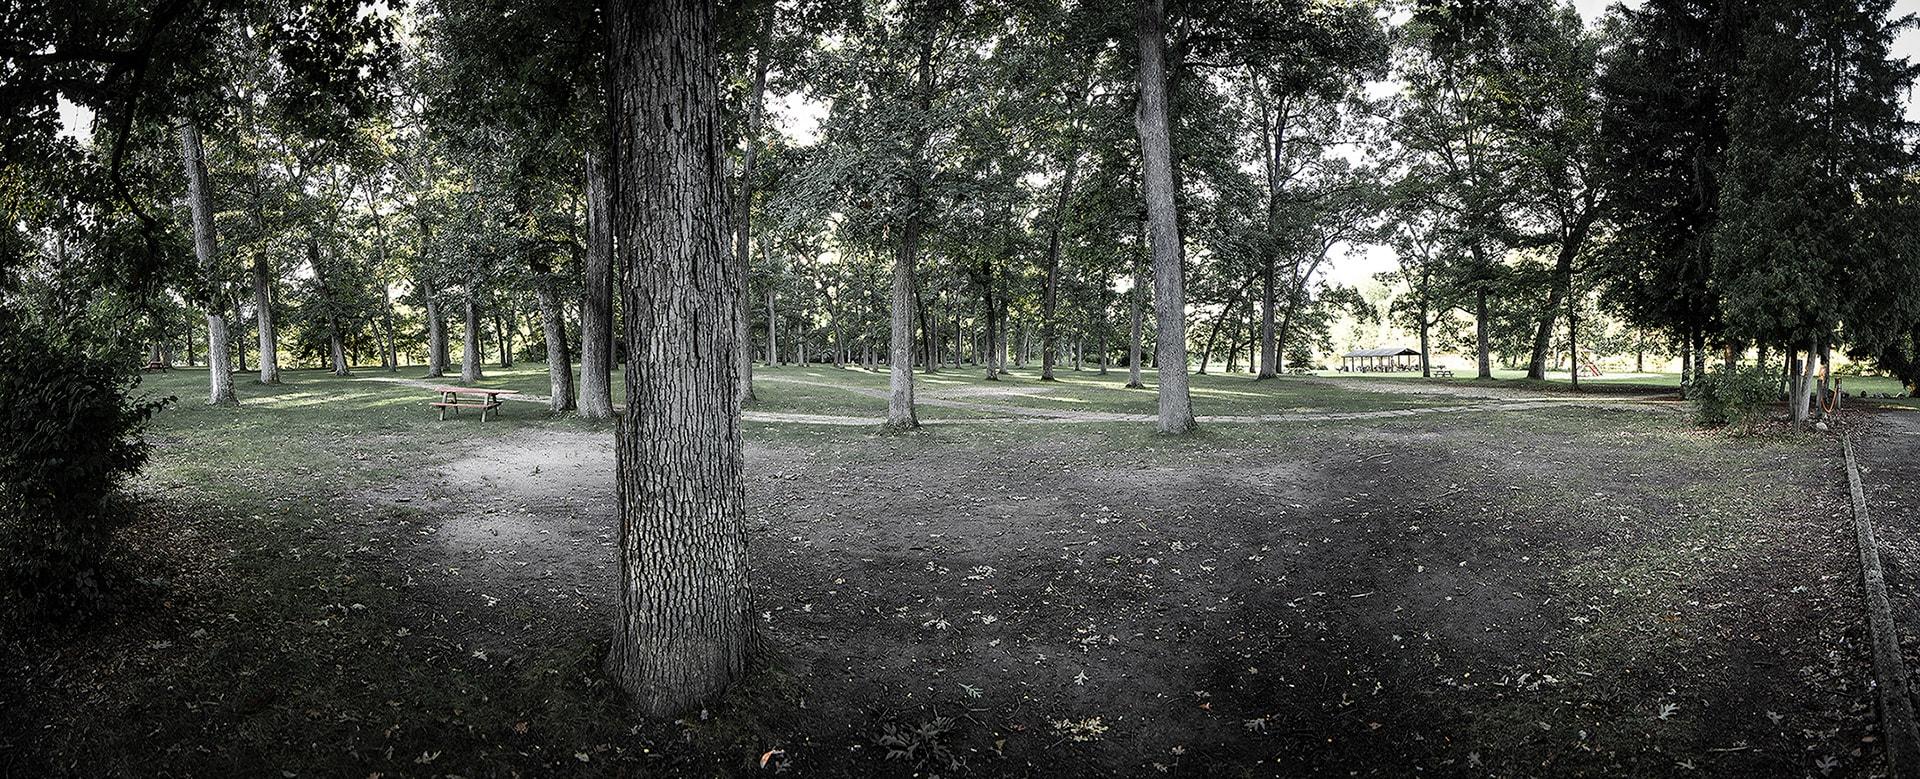 simpson-h-woods-creep-1-iphone-16-min.jpg